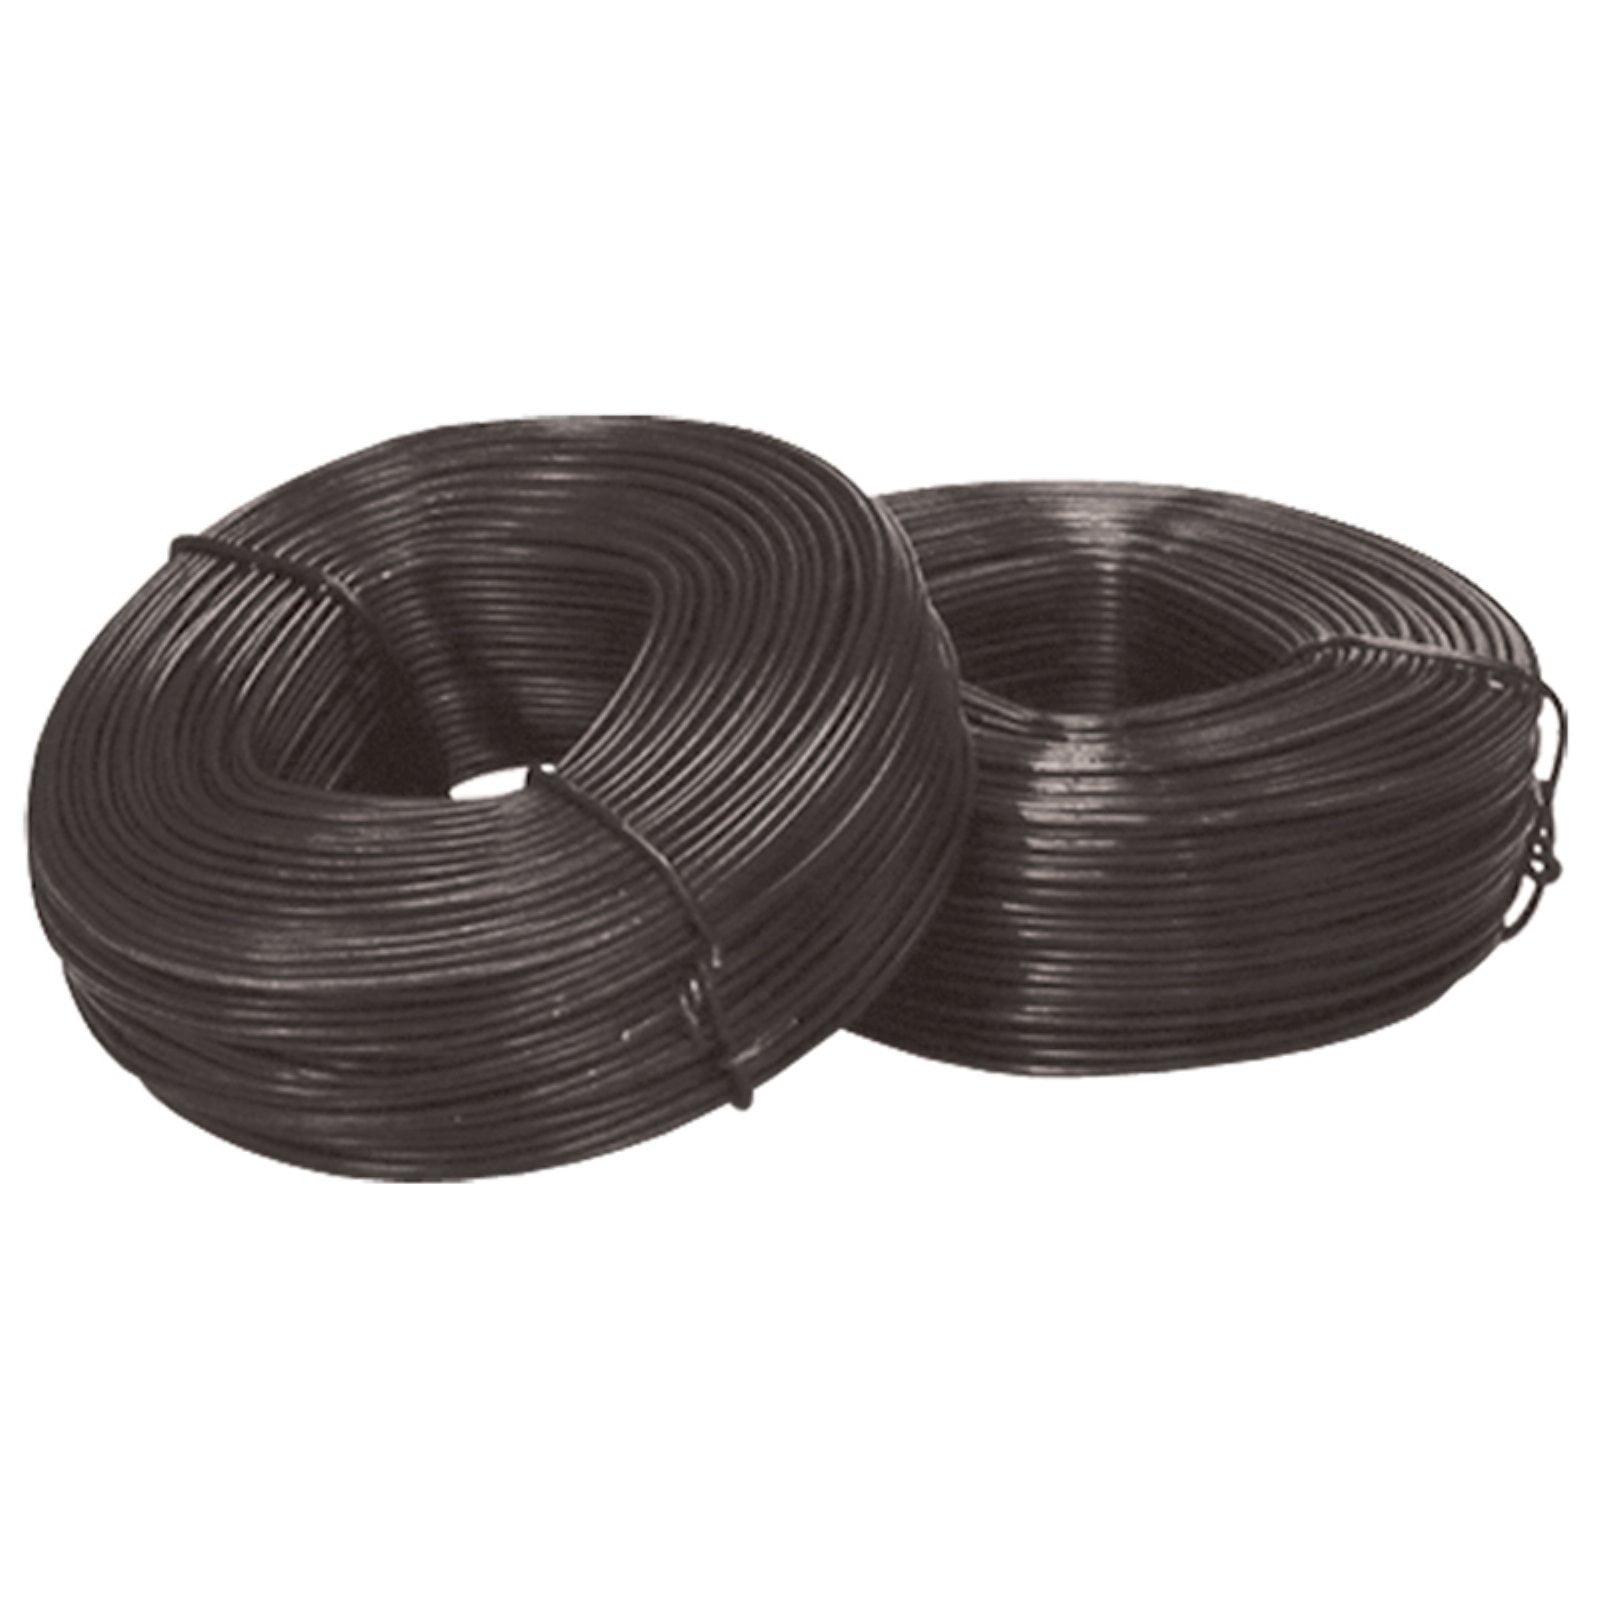 Mat Tie Wire Coil for Rebar - Walmart.com